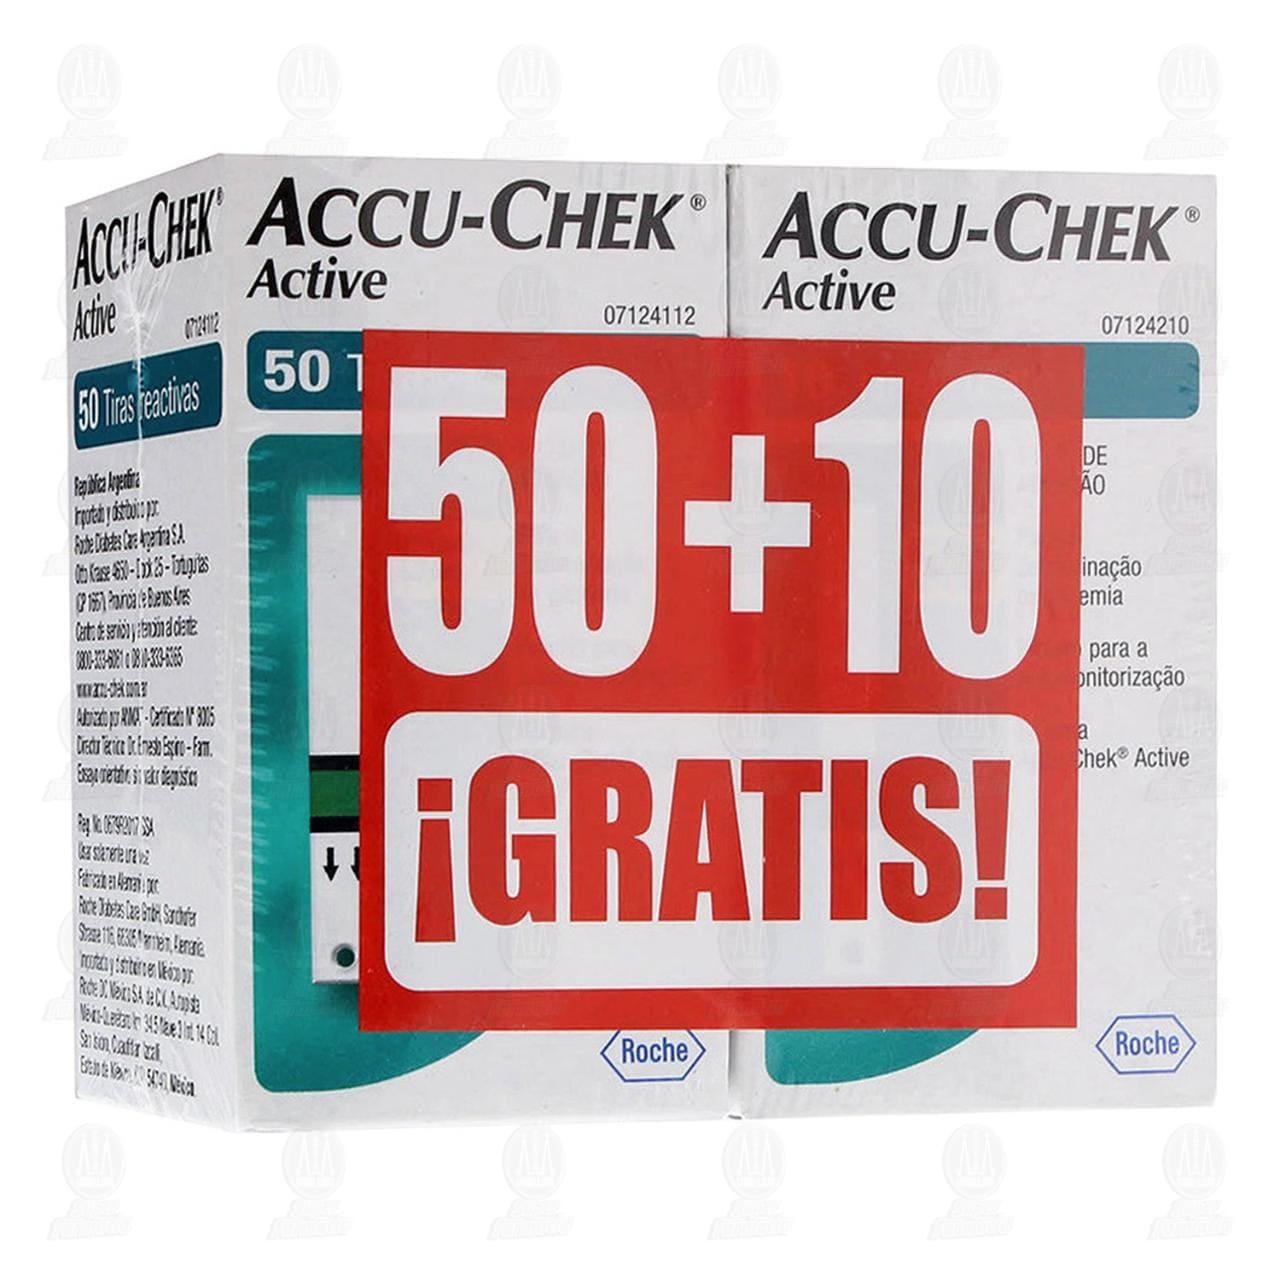 Accu-chek Active Glucose 50 +10 Tiras Gratis